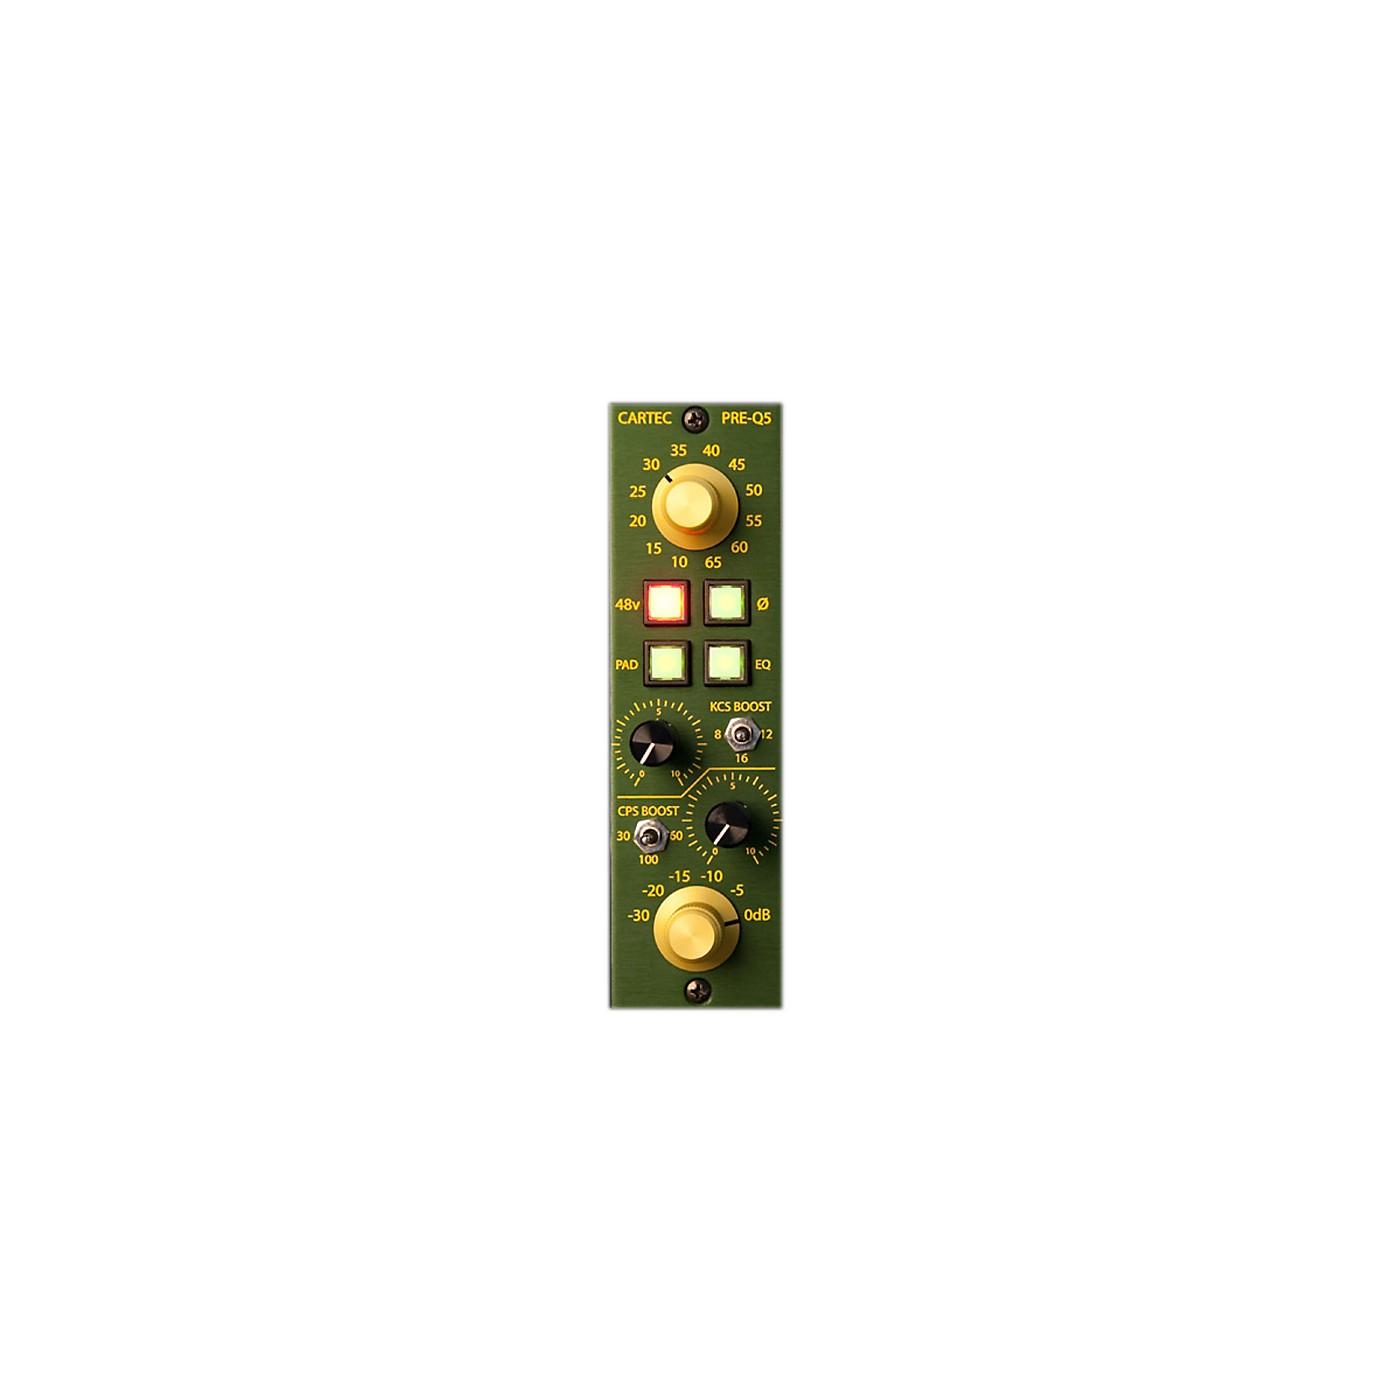 CARTEC Audio PRE-Q5 API 500 Series Mic Preamp thumbnail